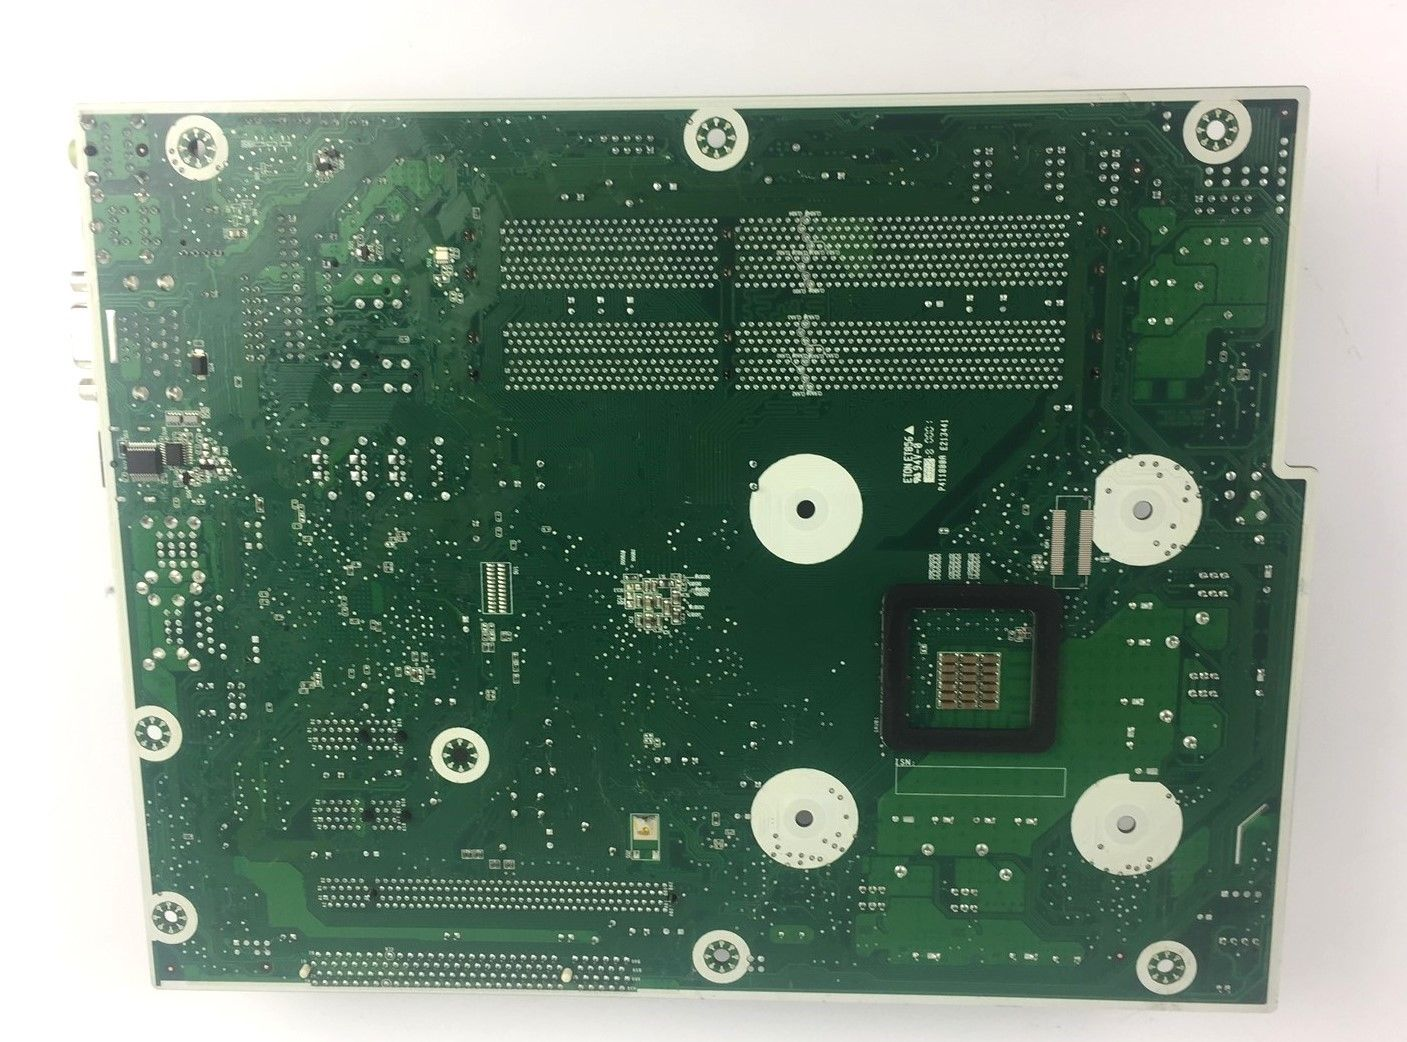 HP Compaq 6000 Pro Microtower Socket 775 SFF Motherboard 531965-001  503363-000